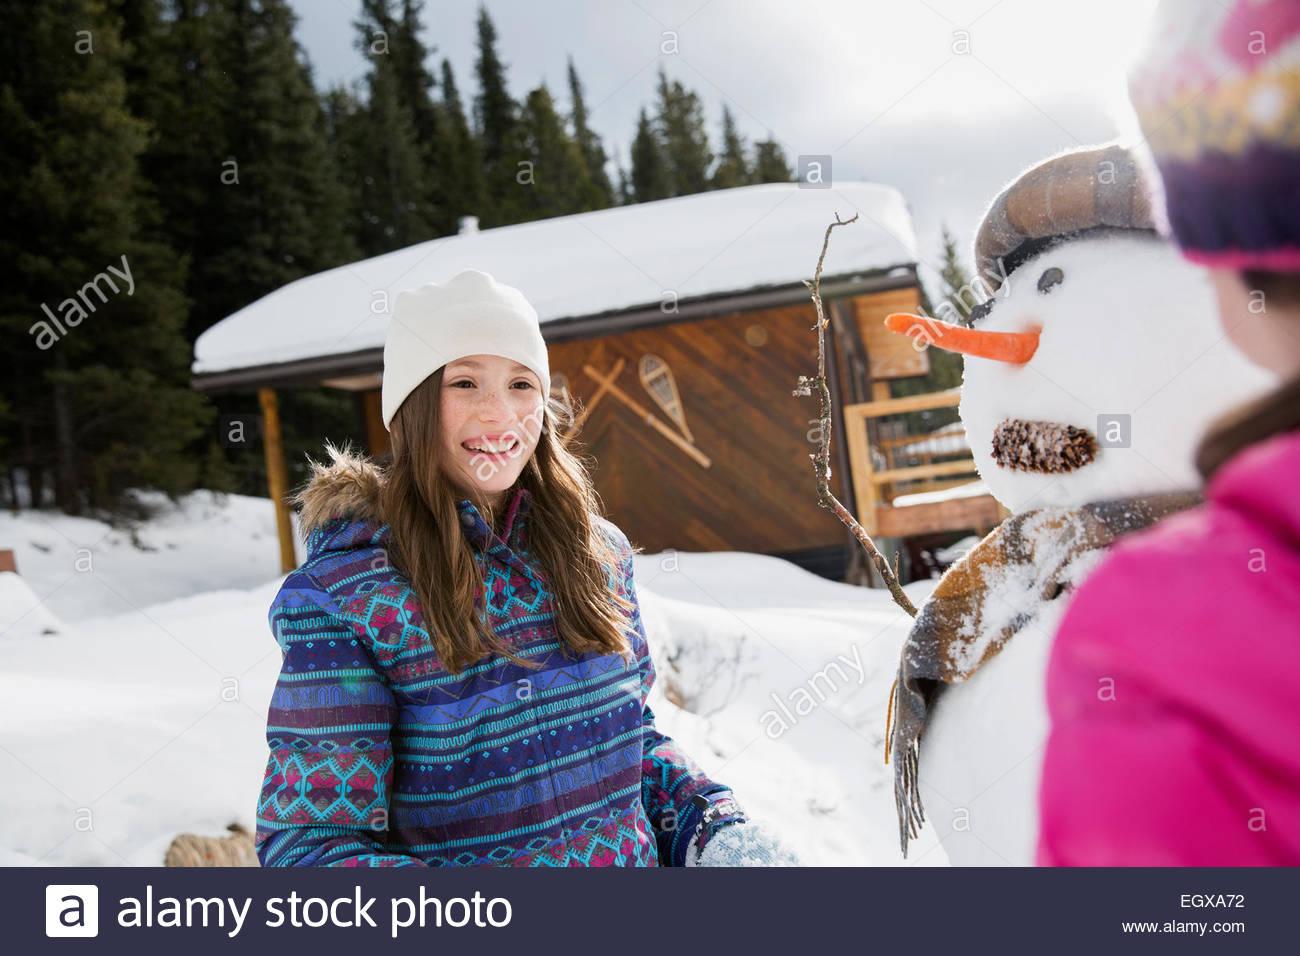 Smiling girl making snowman - Stock Image